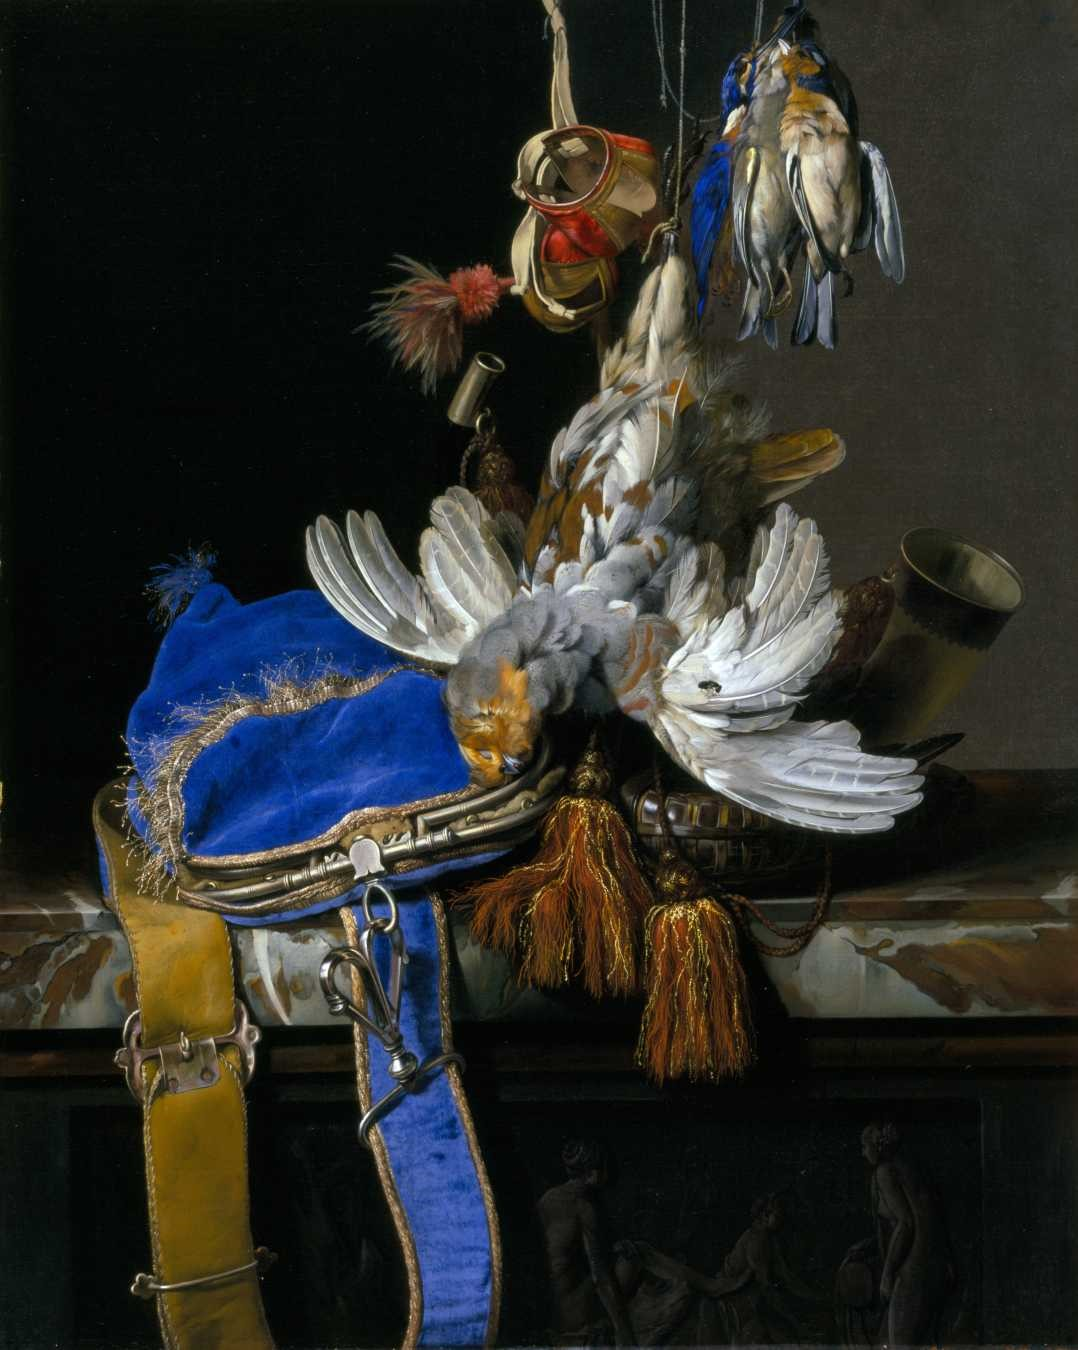 Van Aelst- Hunt Still Life with a Velvet Bag on a Marble Ledge